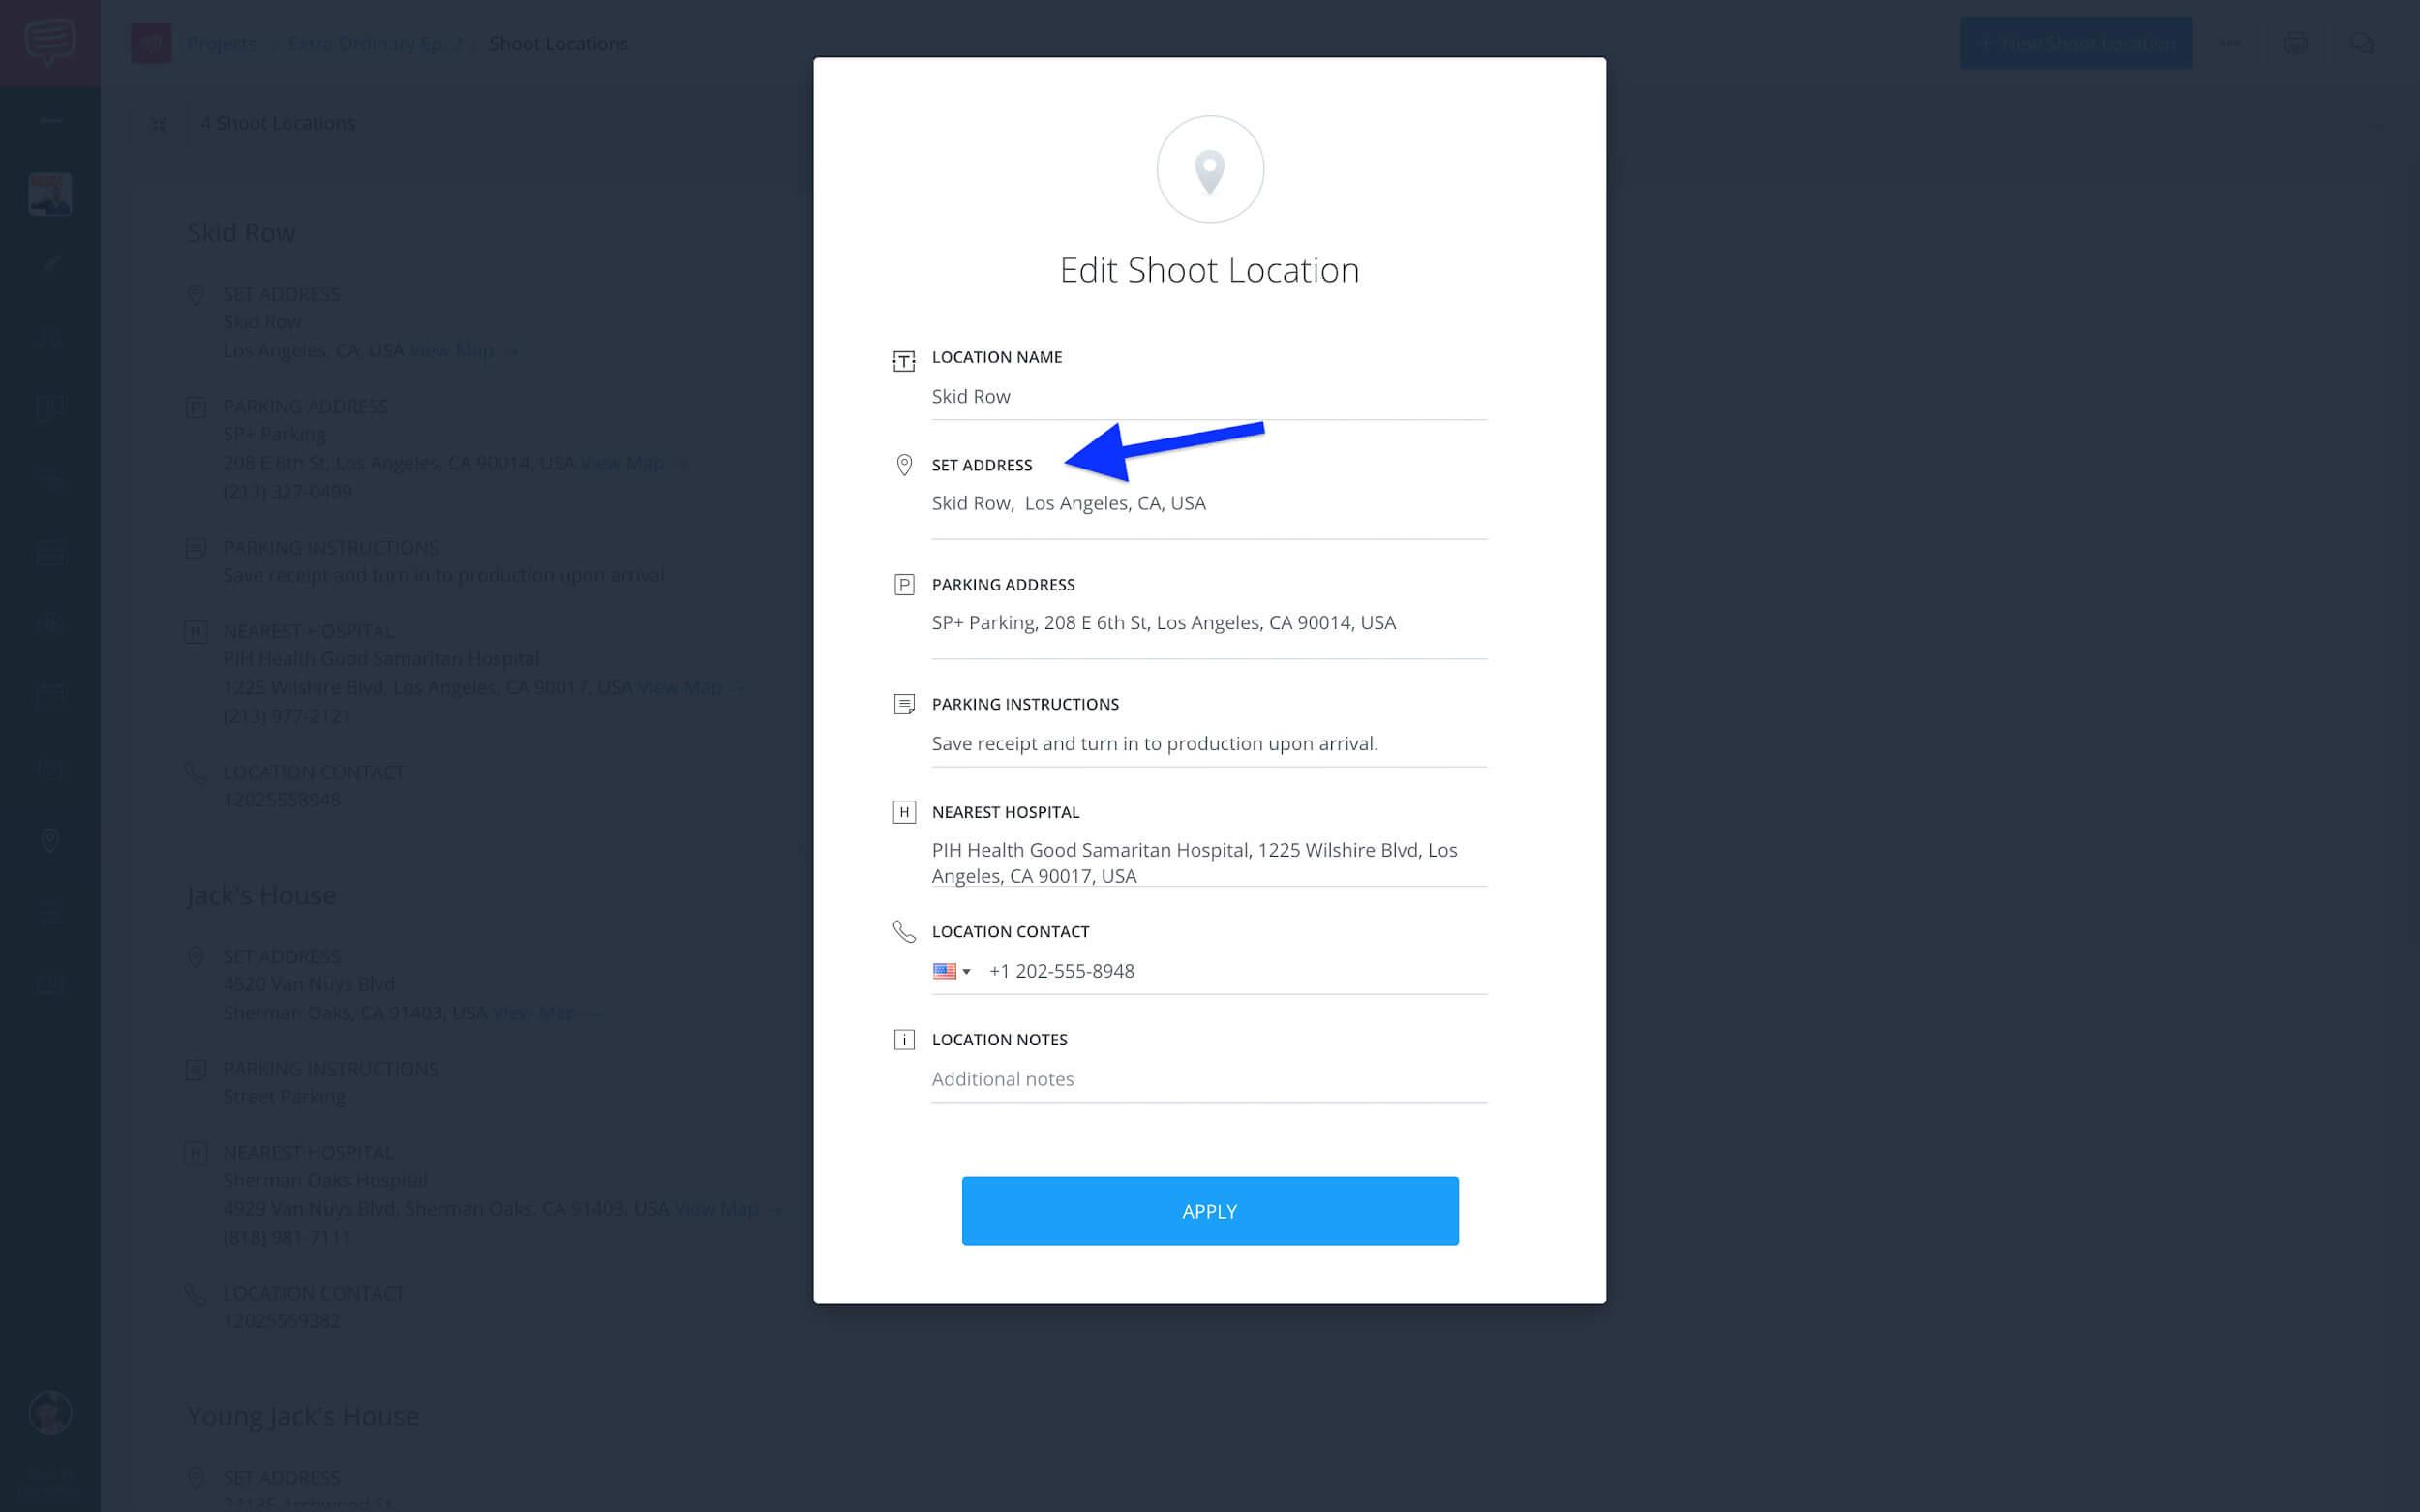 Edit shoot location - Confirm set address